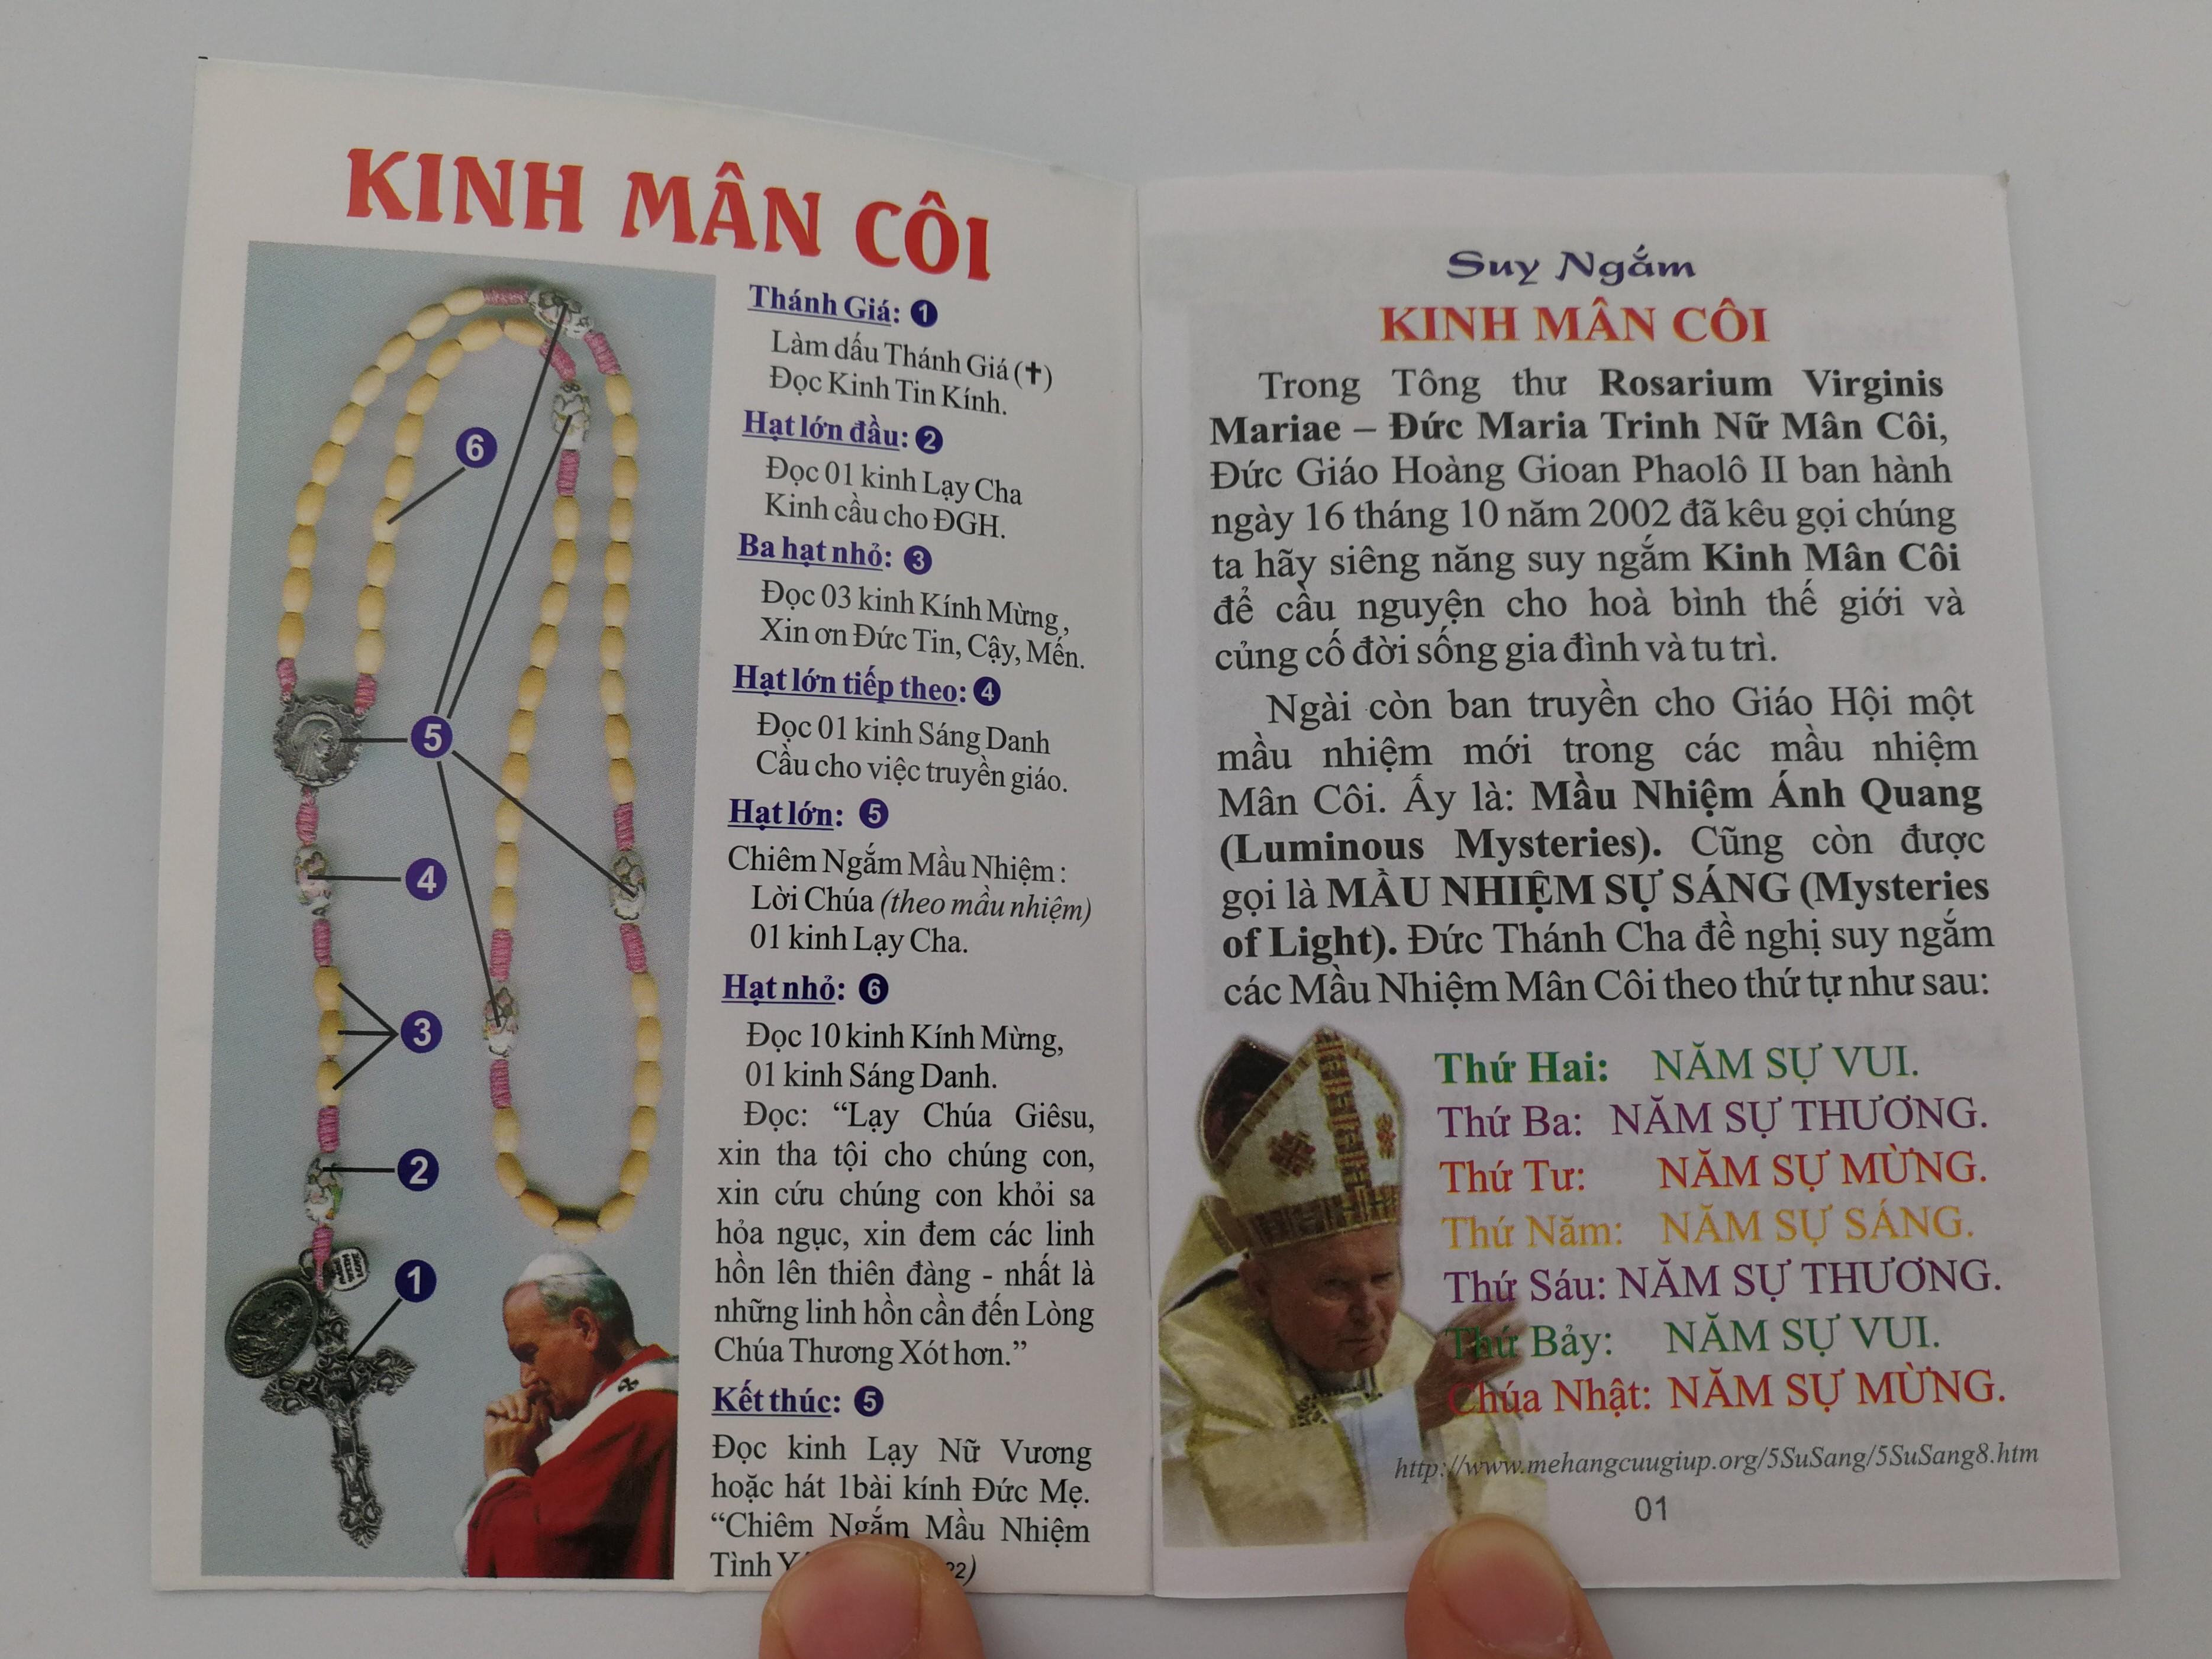 kinh-m-n-c-i-vietnamese-catholic-rosary-book-prayerbook-3.jpg